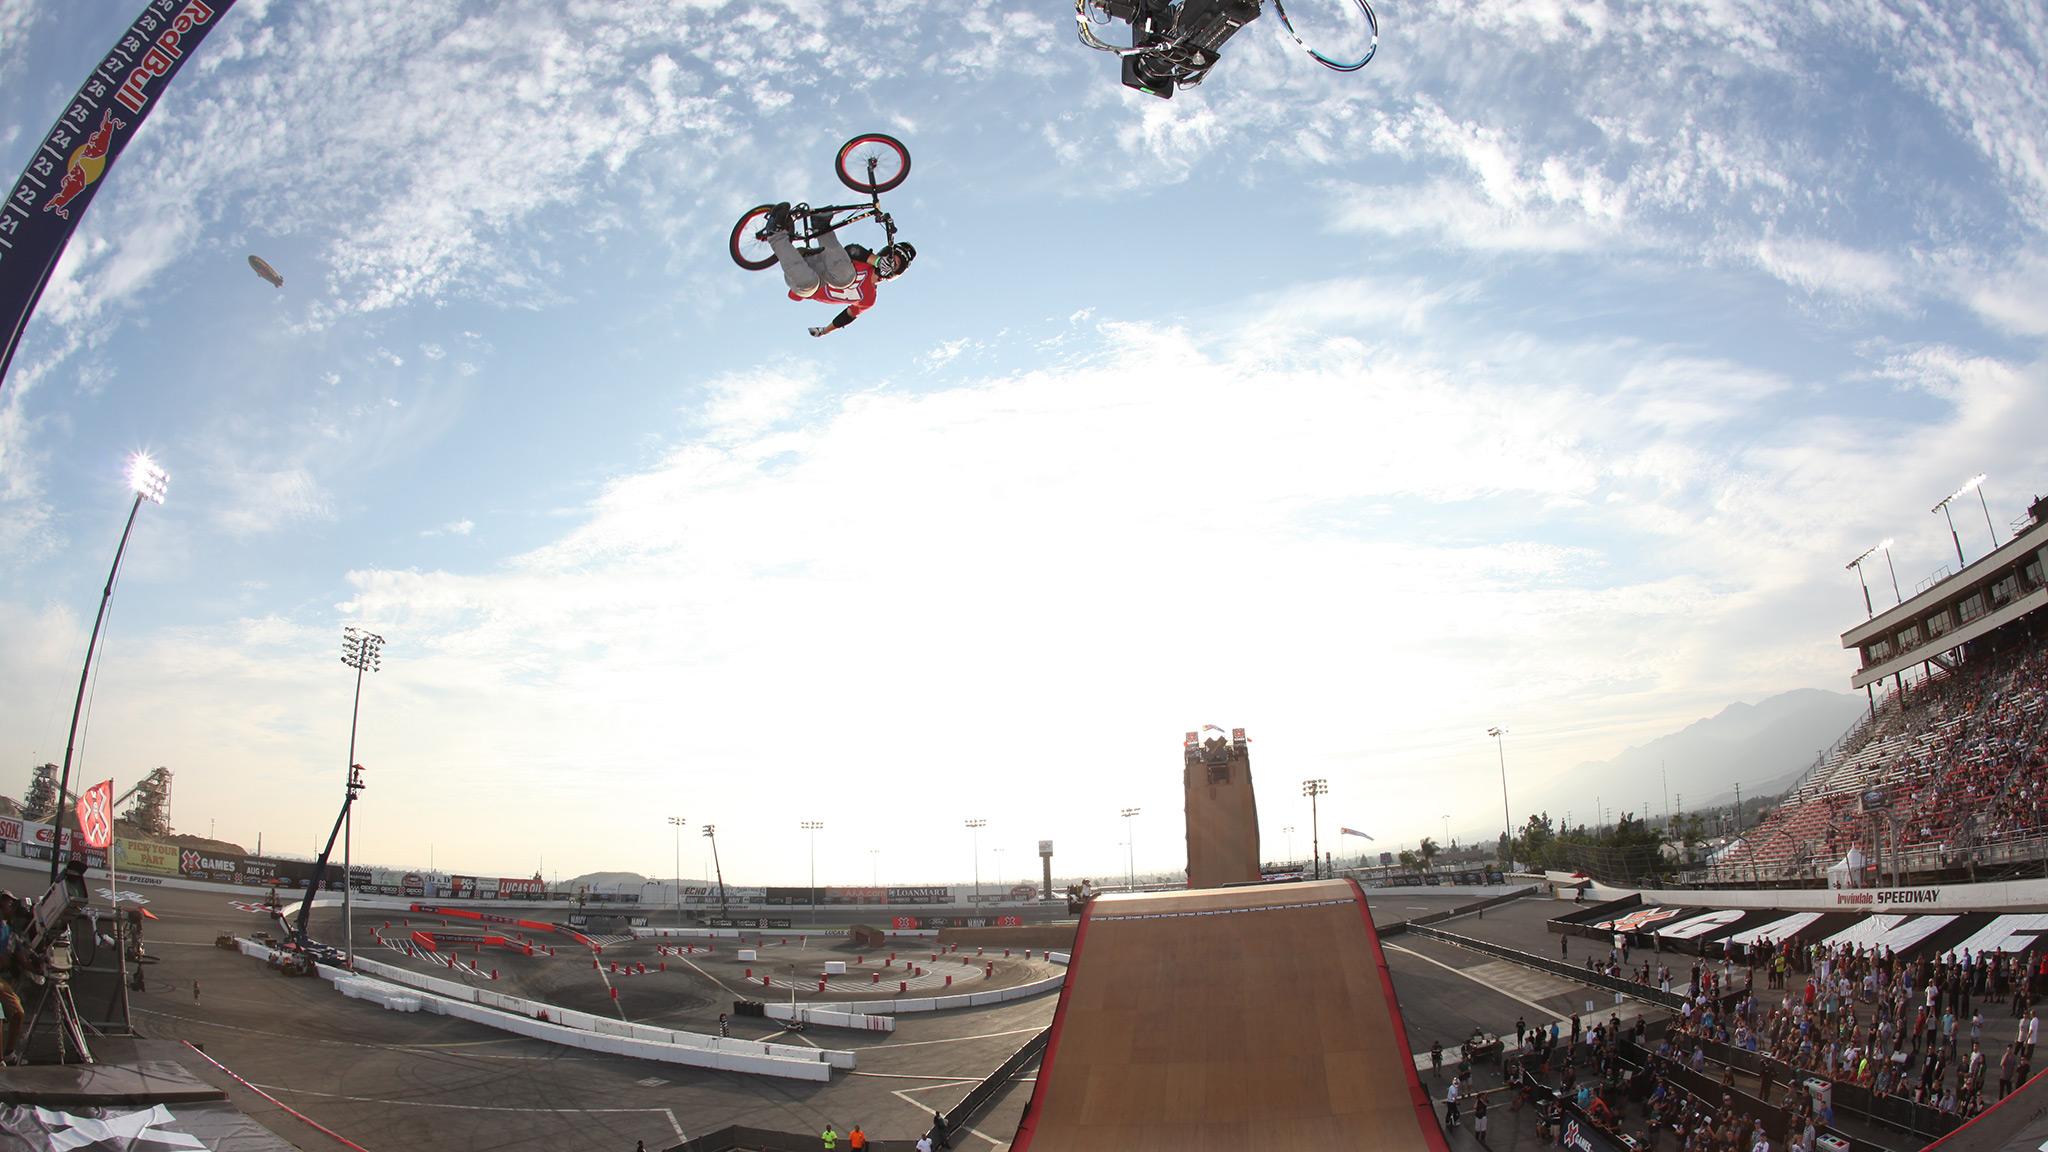 Morgan Wade -- BMX Big Air